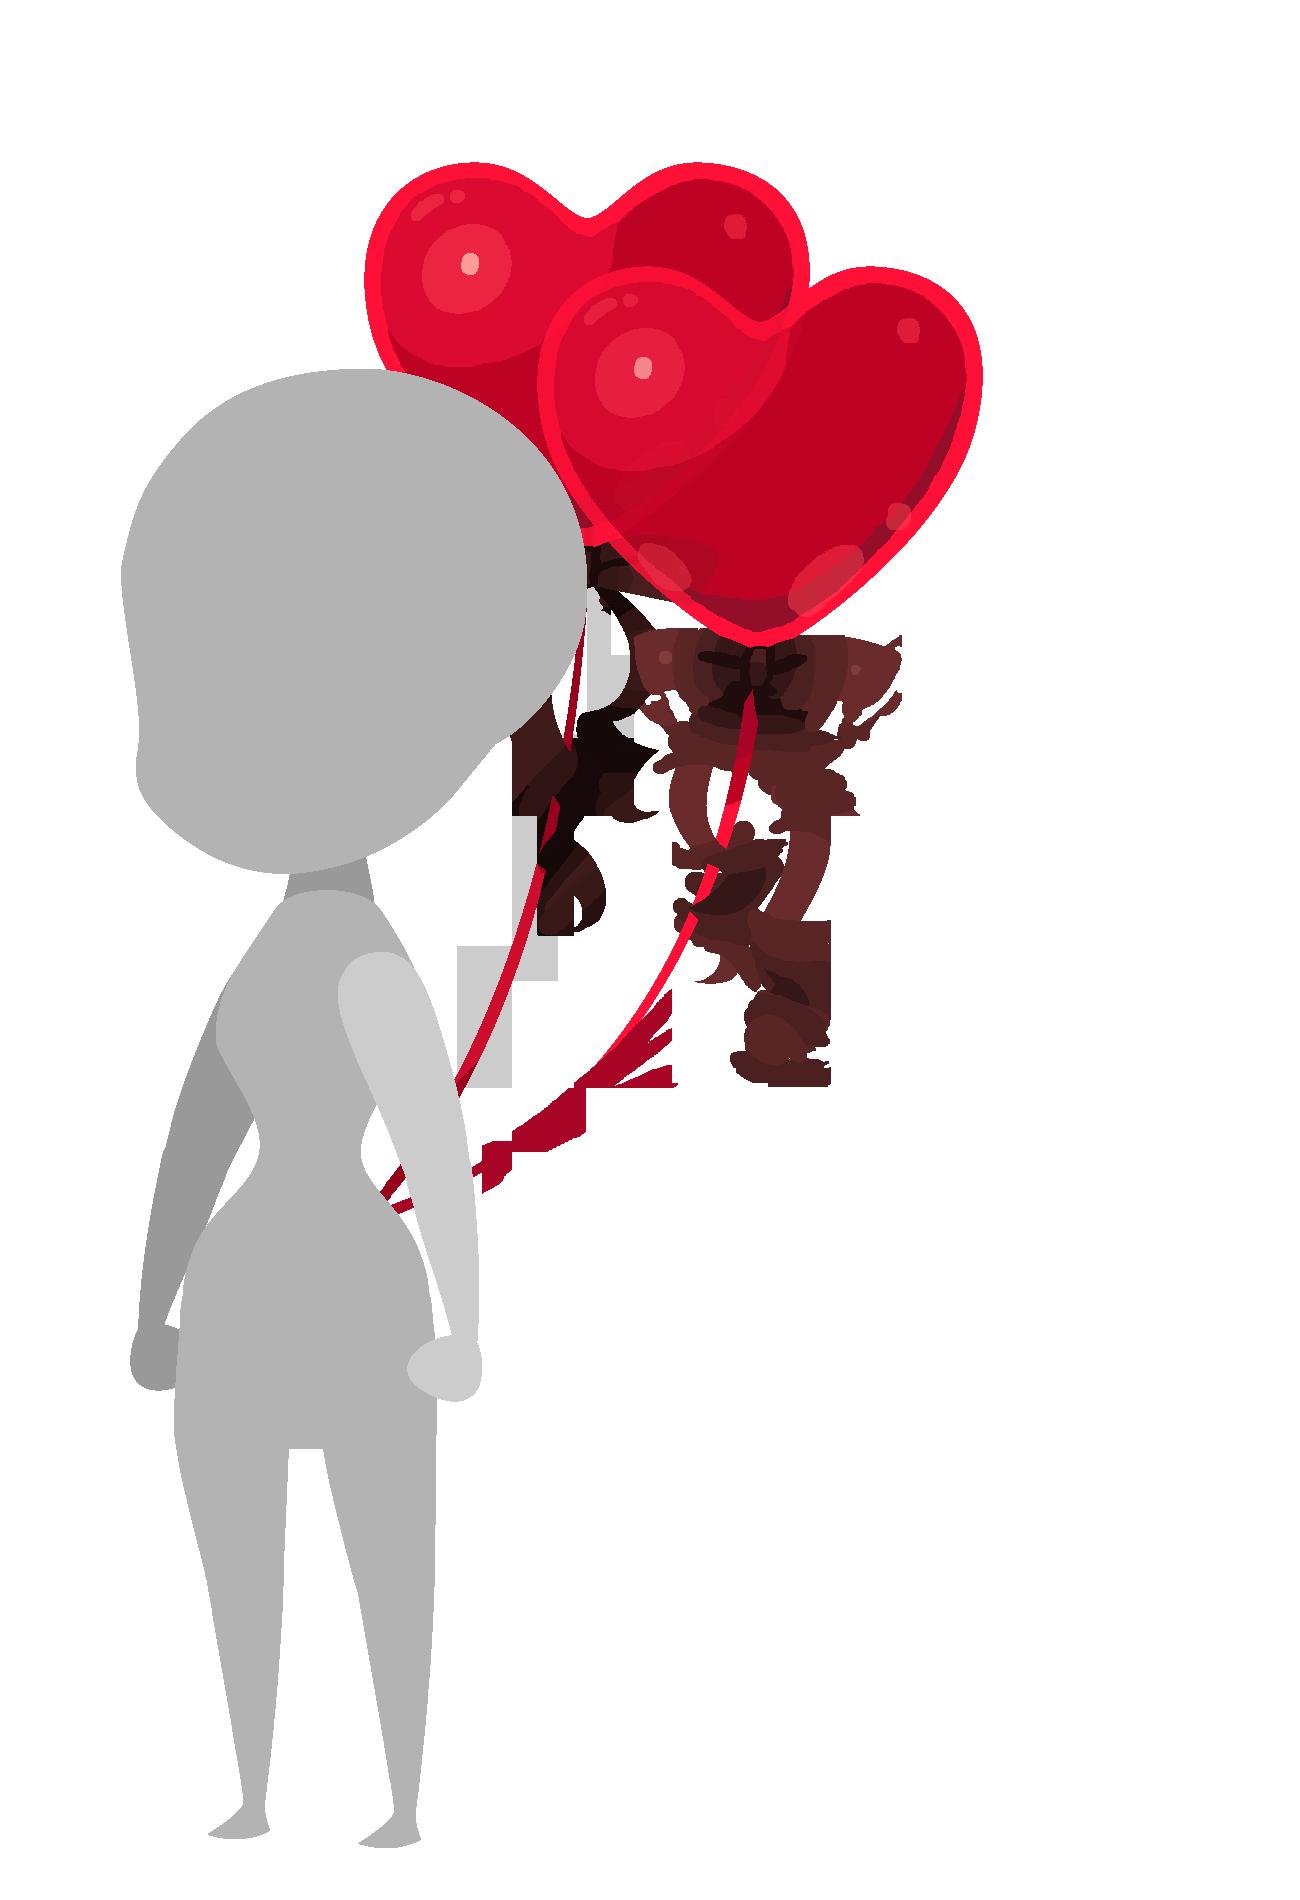 Heart with cross inside clipart clip art free February 1st - Kingdom Hearts Union χ ENG Update - News - Kingdom ... clip art free